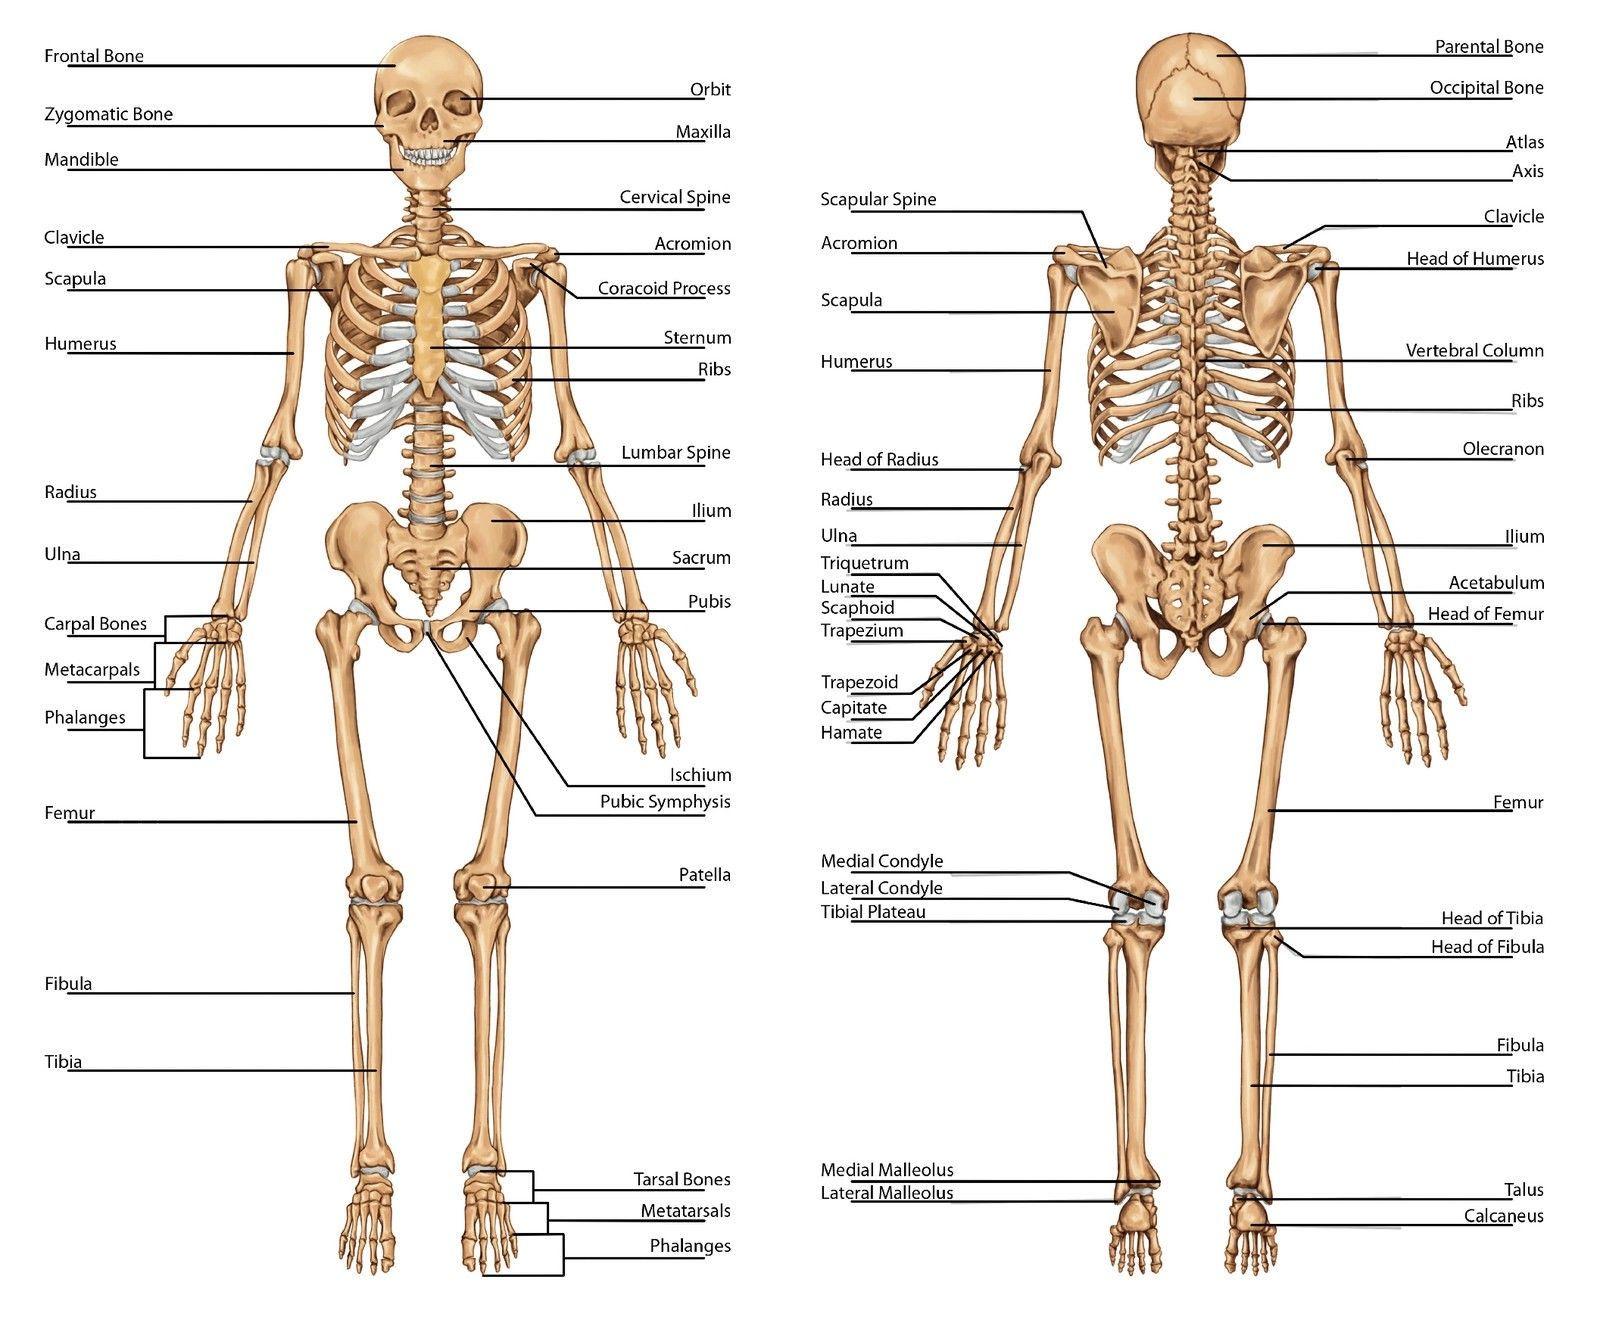 hight resolution of diagram of the human body skeleton inspirational skeleton anatomy rh pinterest fr human skeleton diagram human bone structure diagram